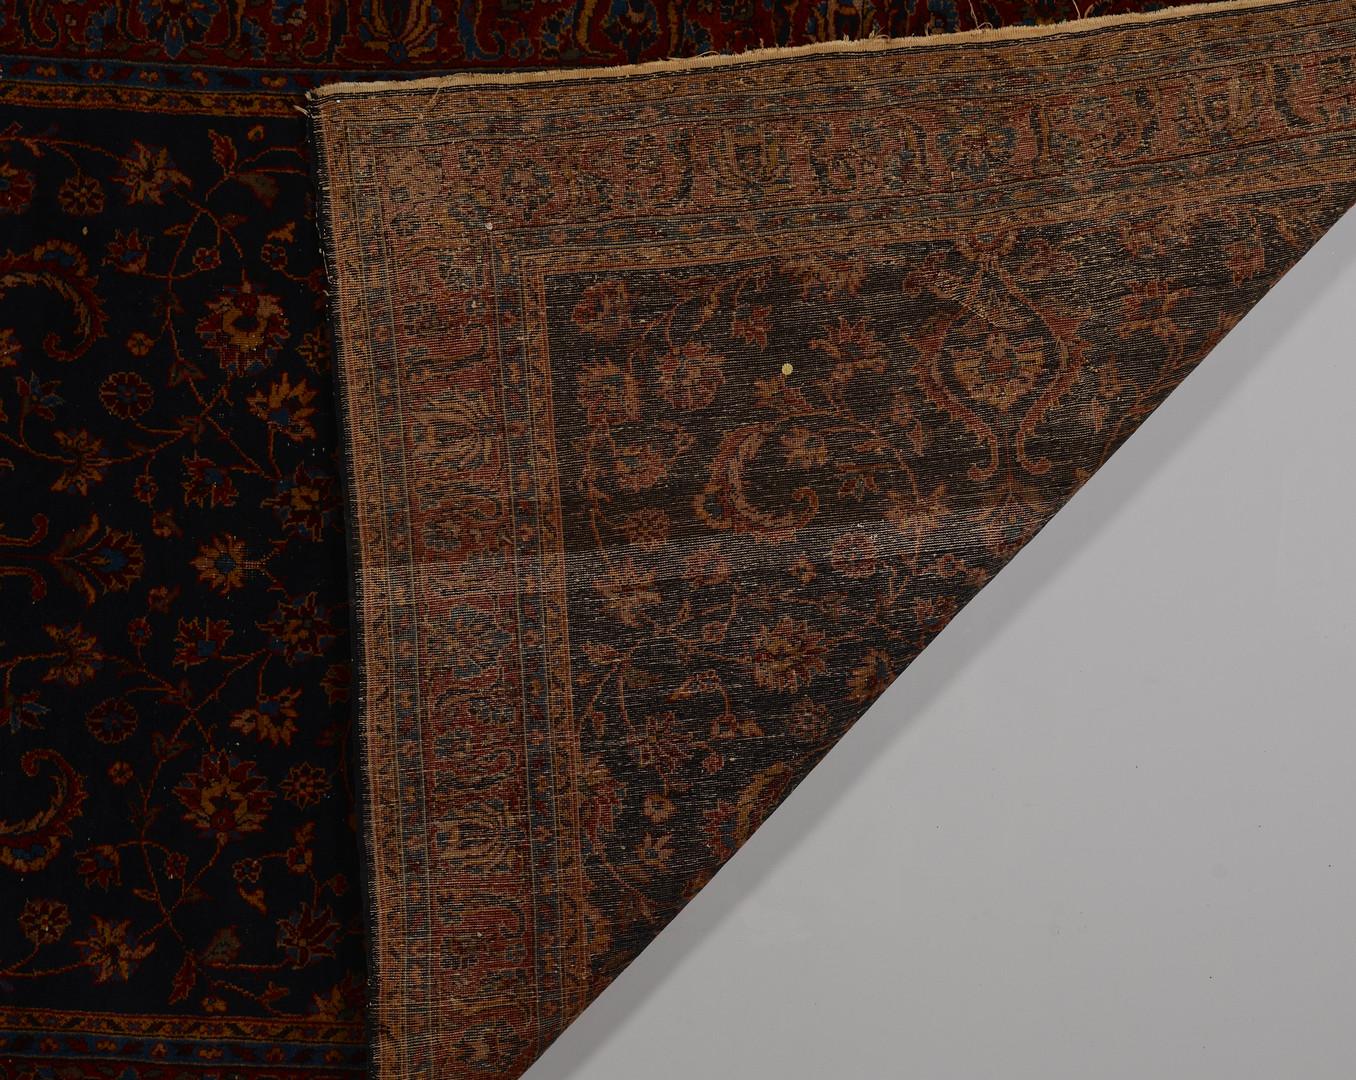 Lot 831: Semi-Antique Persian Sarouk